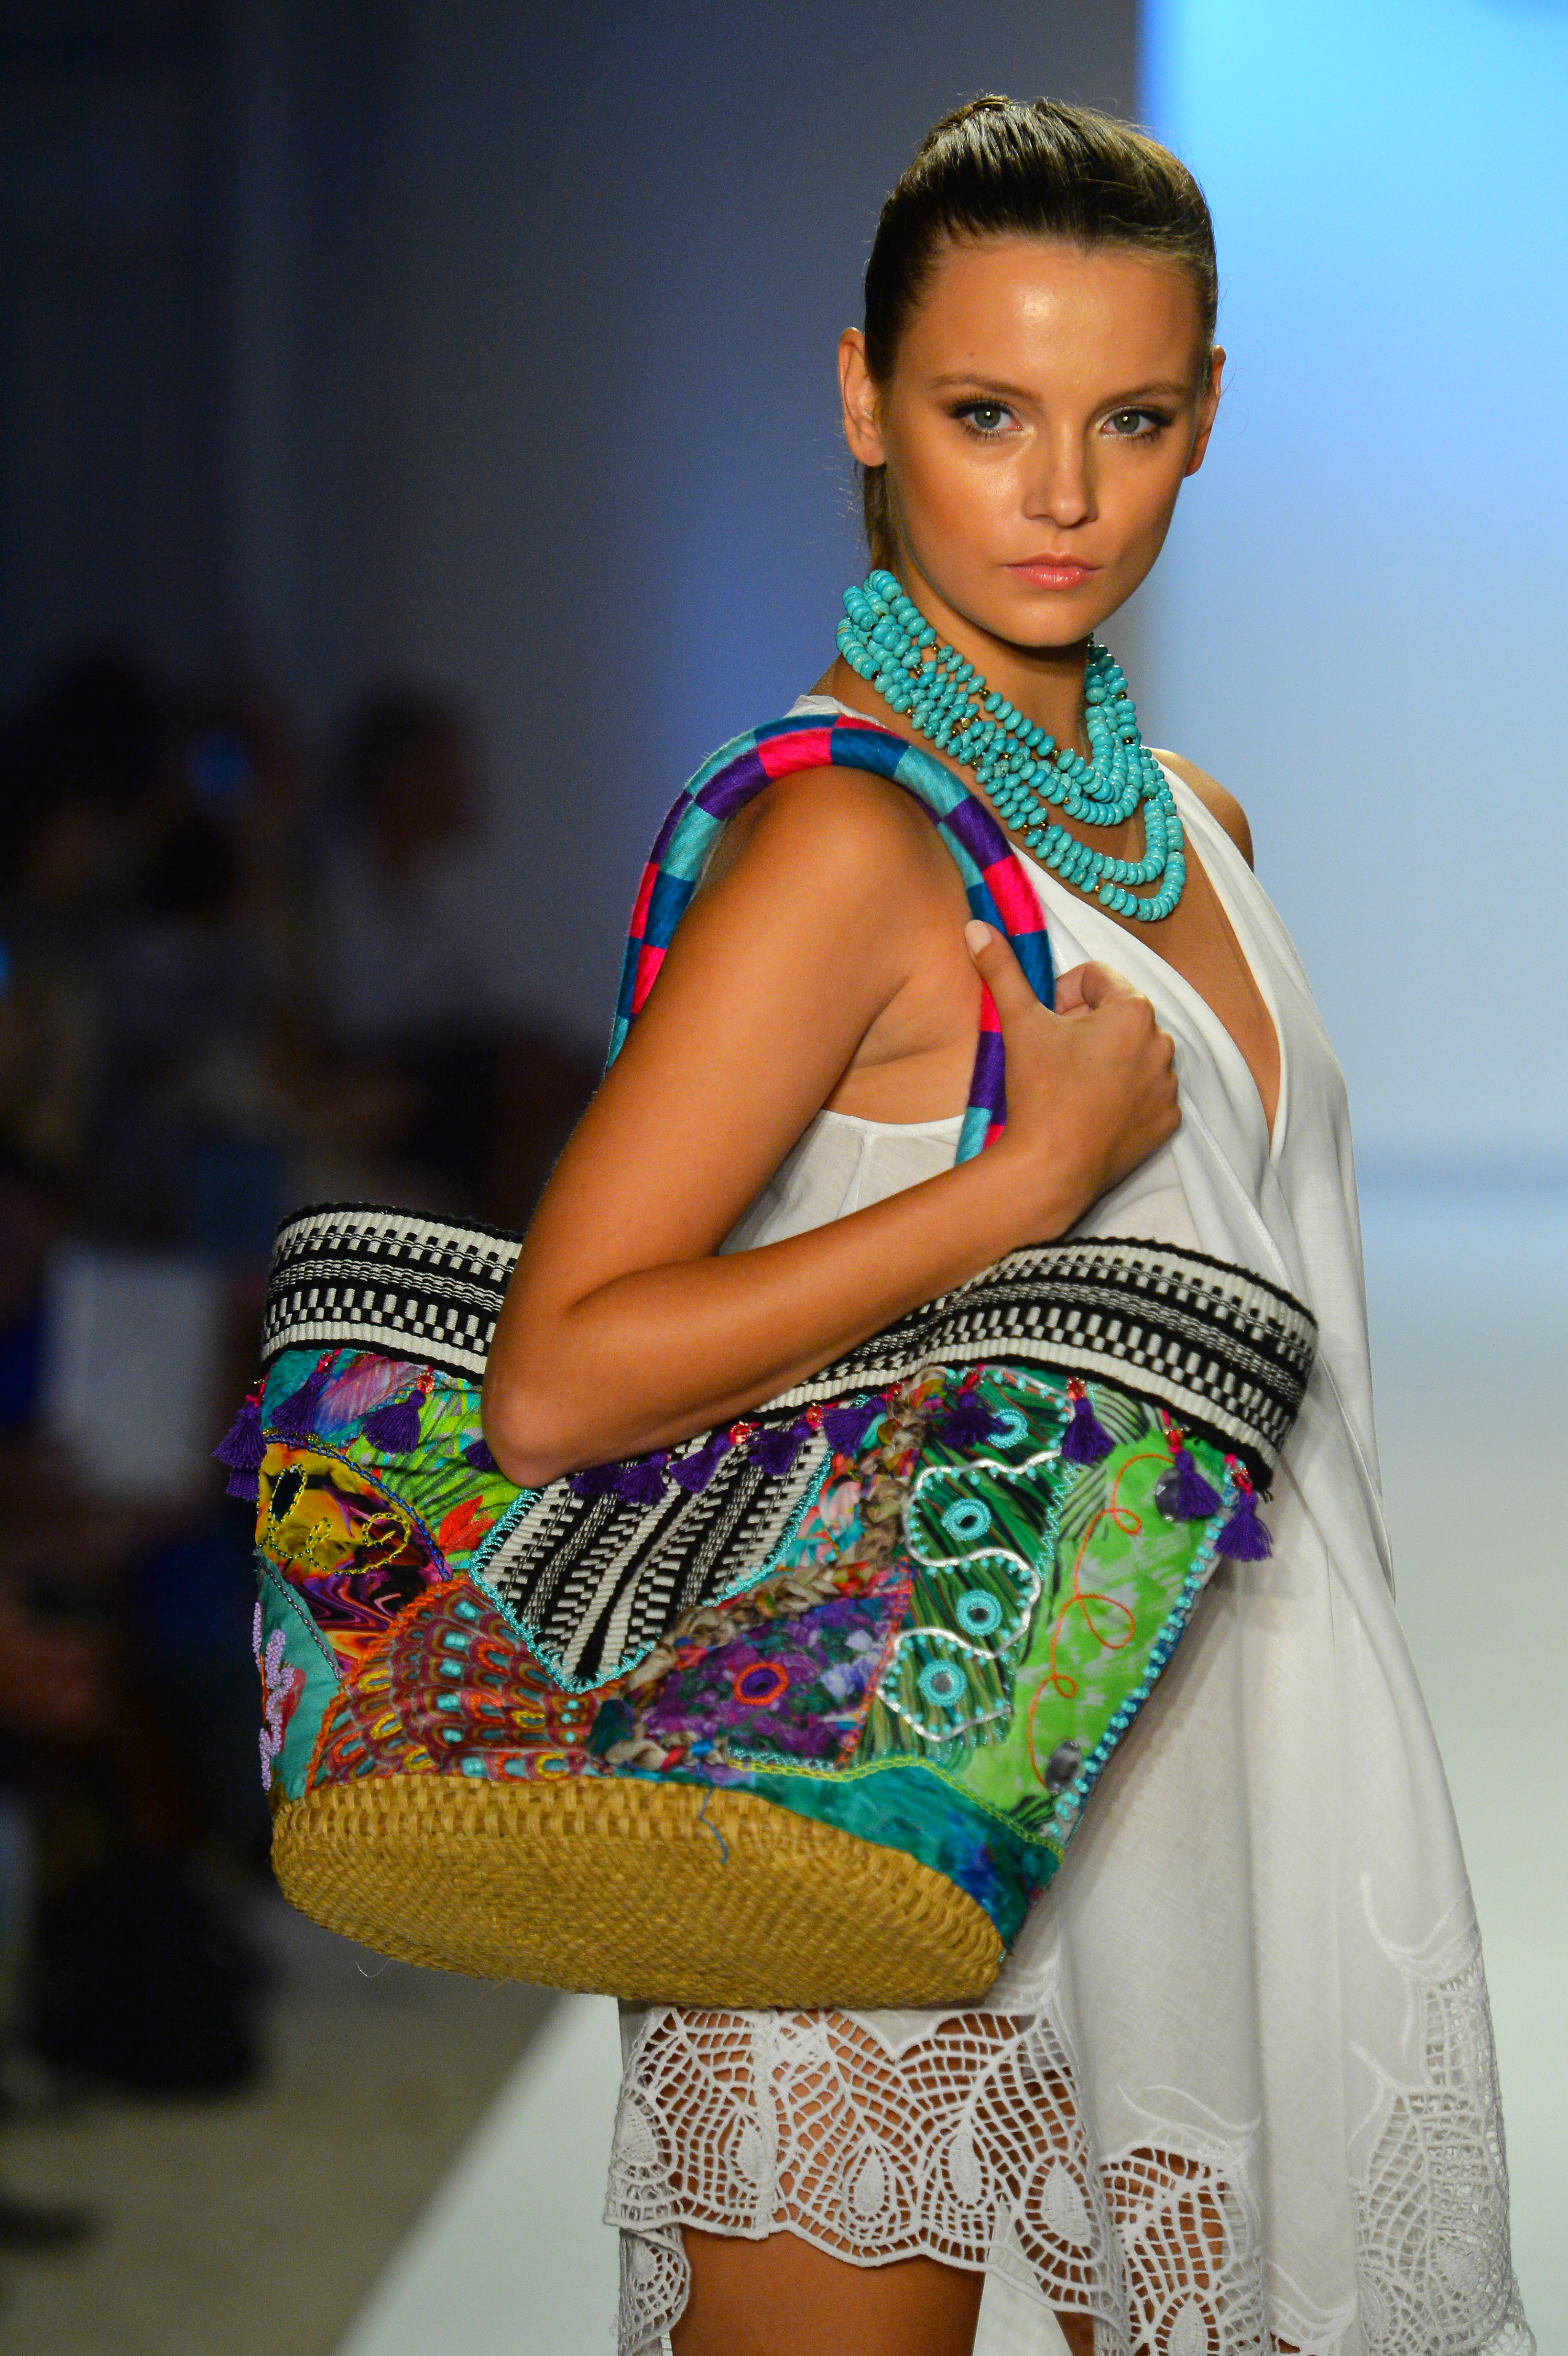 The Indian Handbag Affair